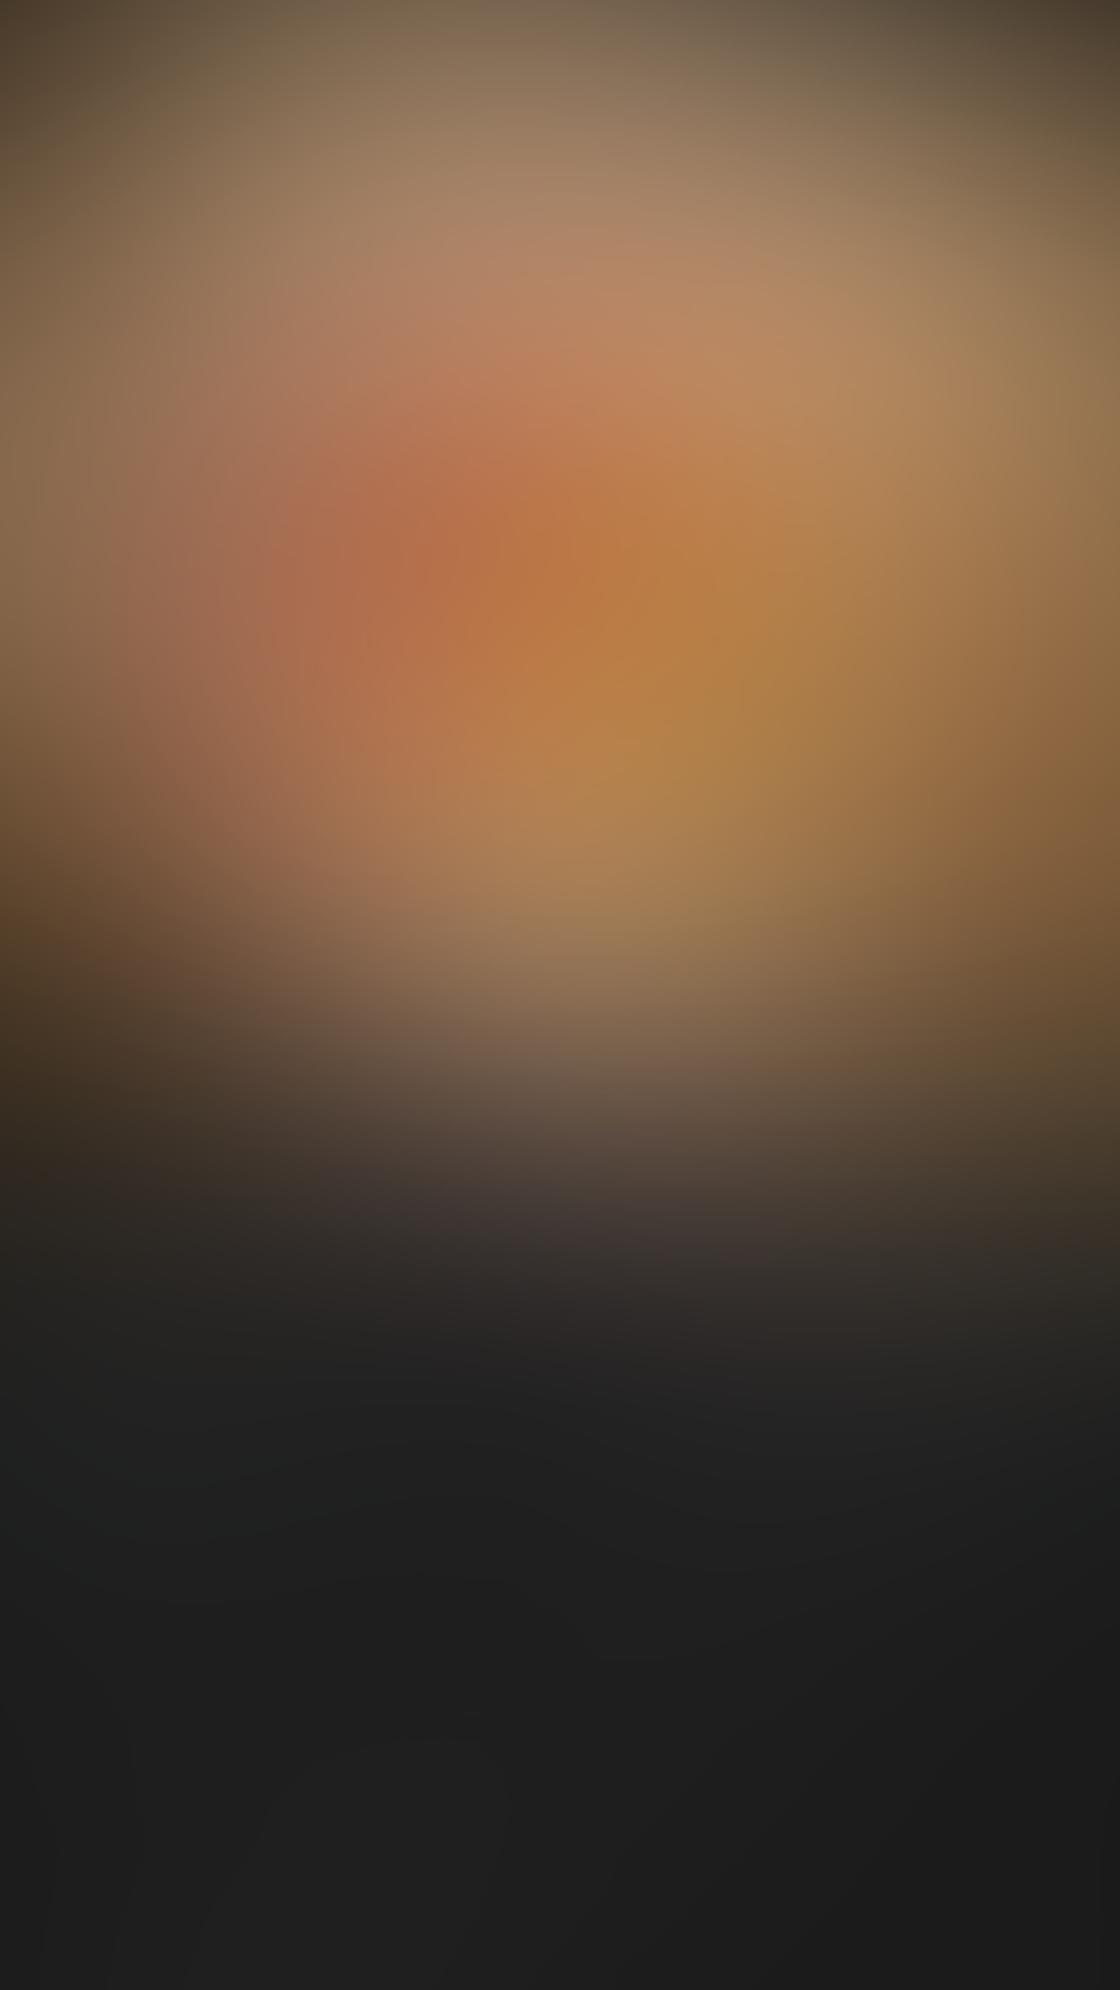 iPhone Photos Darkroom App 5